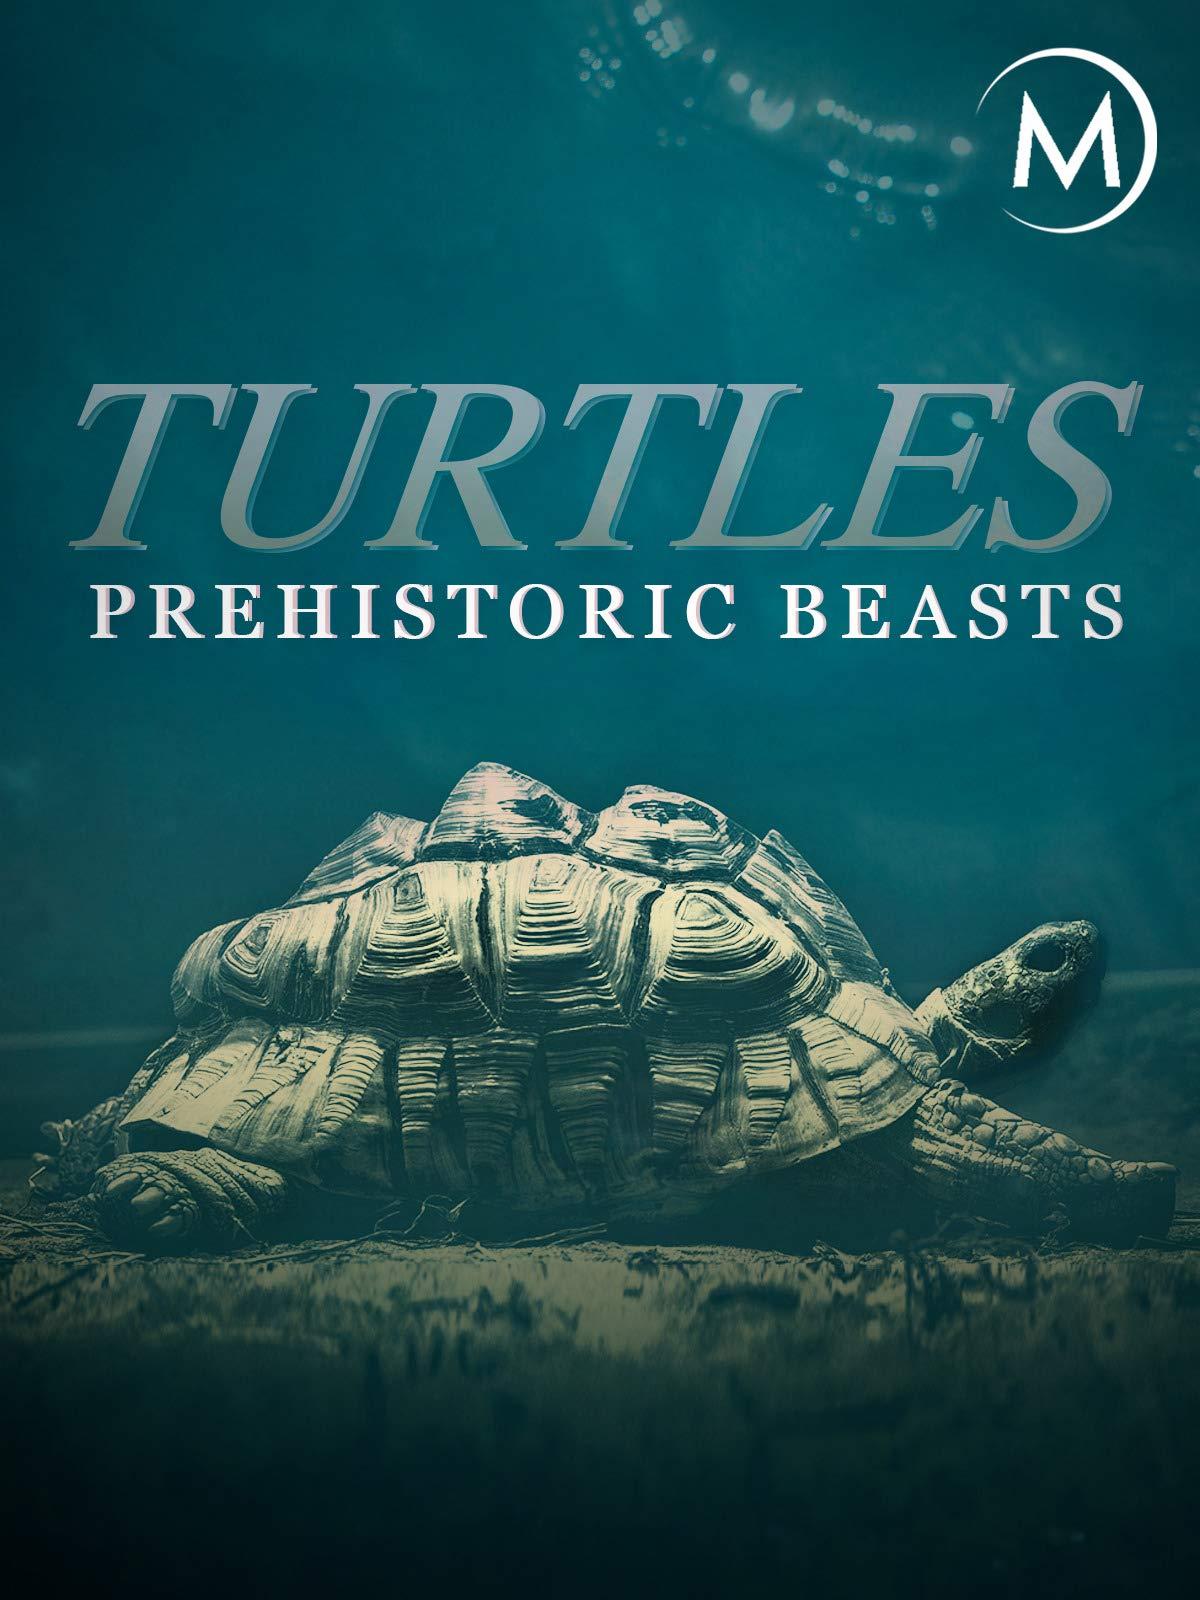 Turtles: Prehistoric Beasts on Amazon Prime Video UK